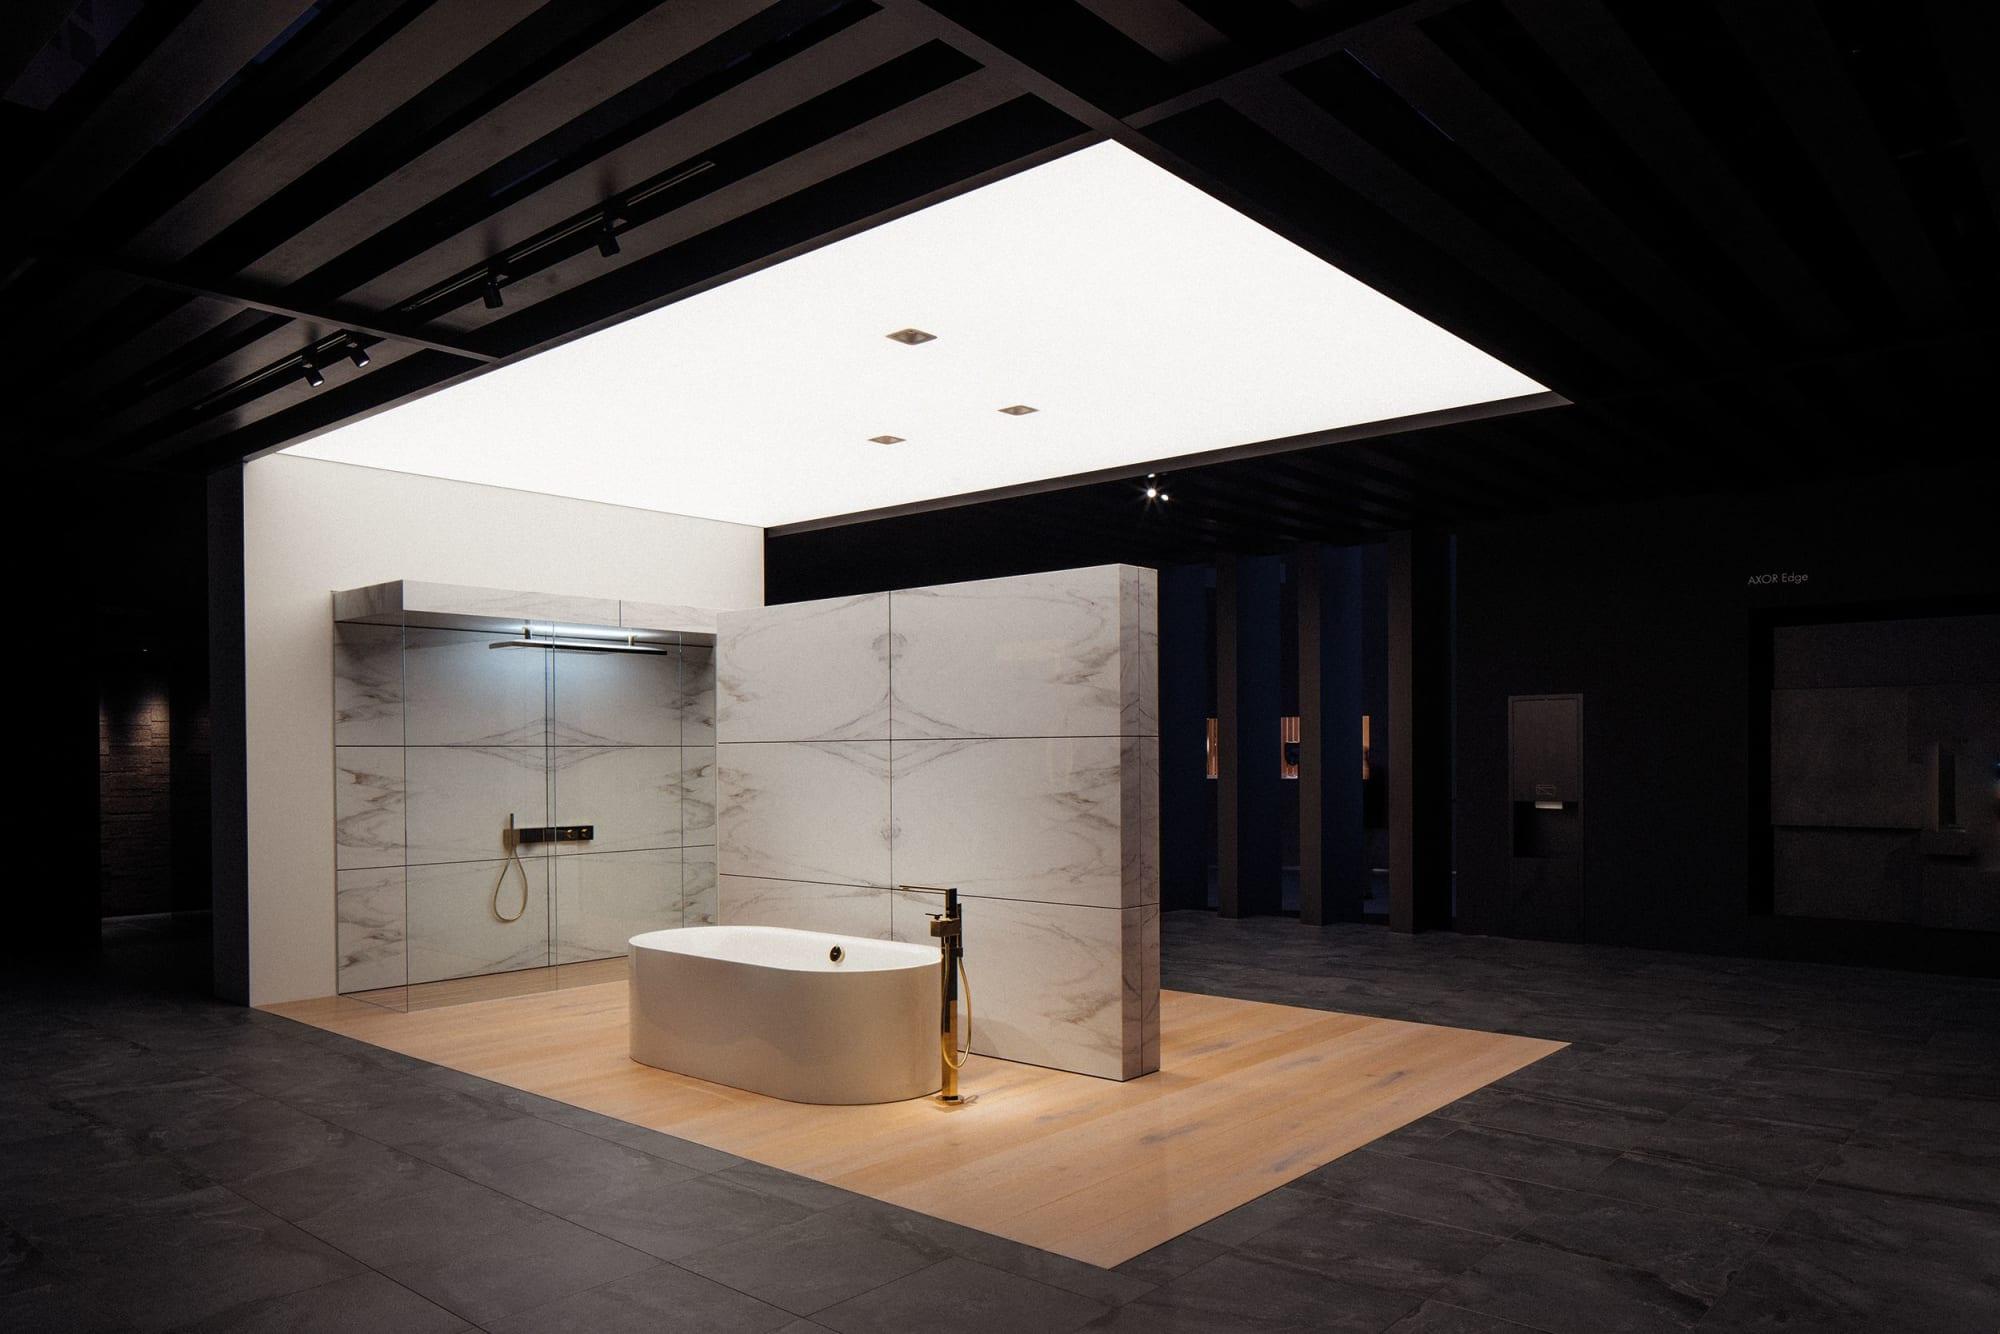 Interior Design by 1zu33 seen at Frankfurt(Main) Messe, Frankfurt - Booth at ISH 2019, hansgrohe/AXOR